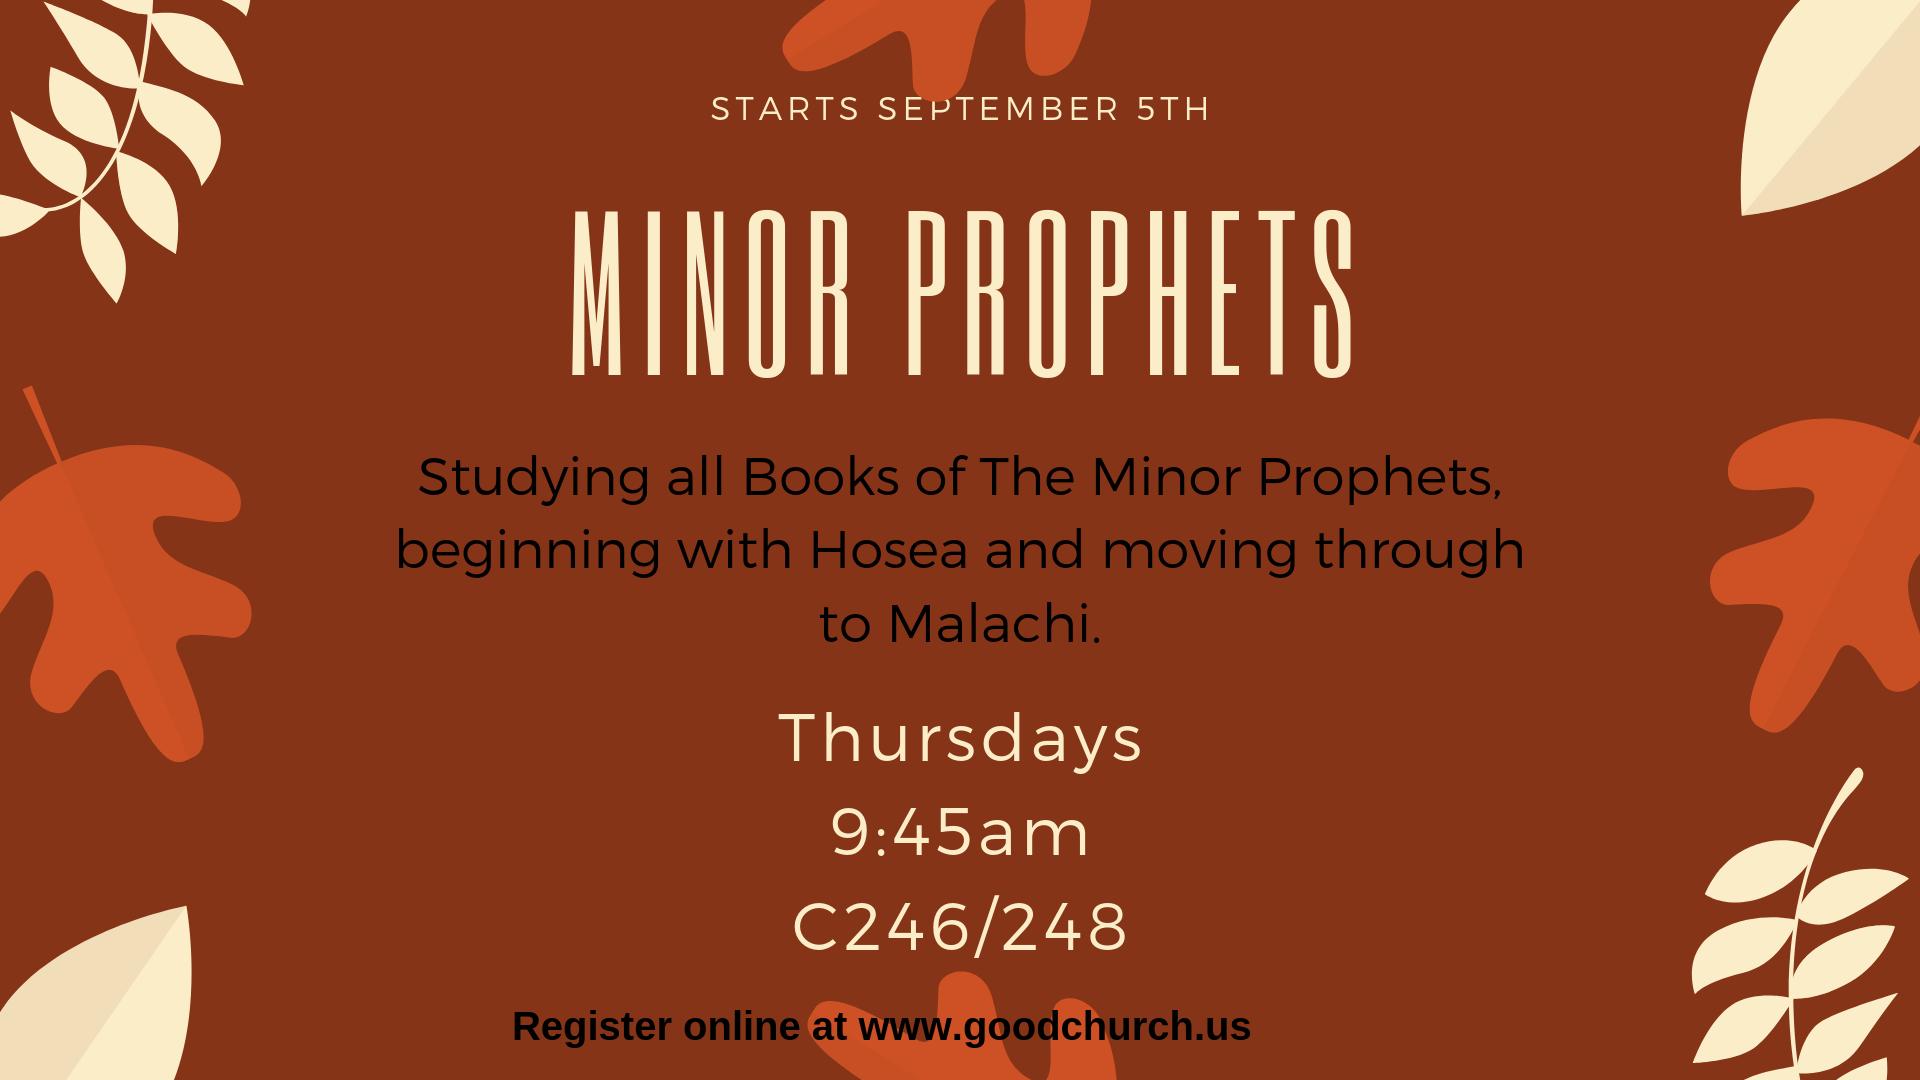 Minor prophets Loop HD.png